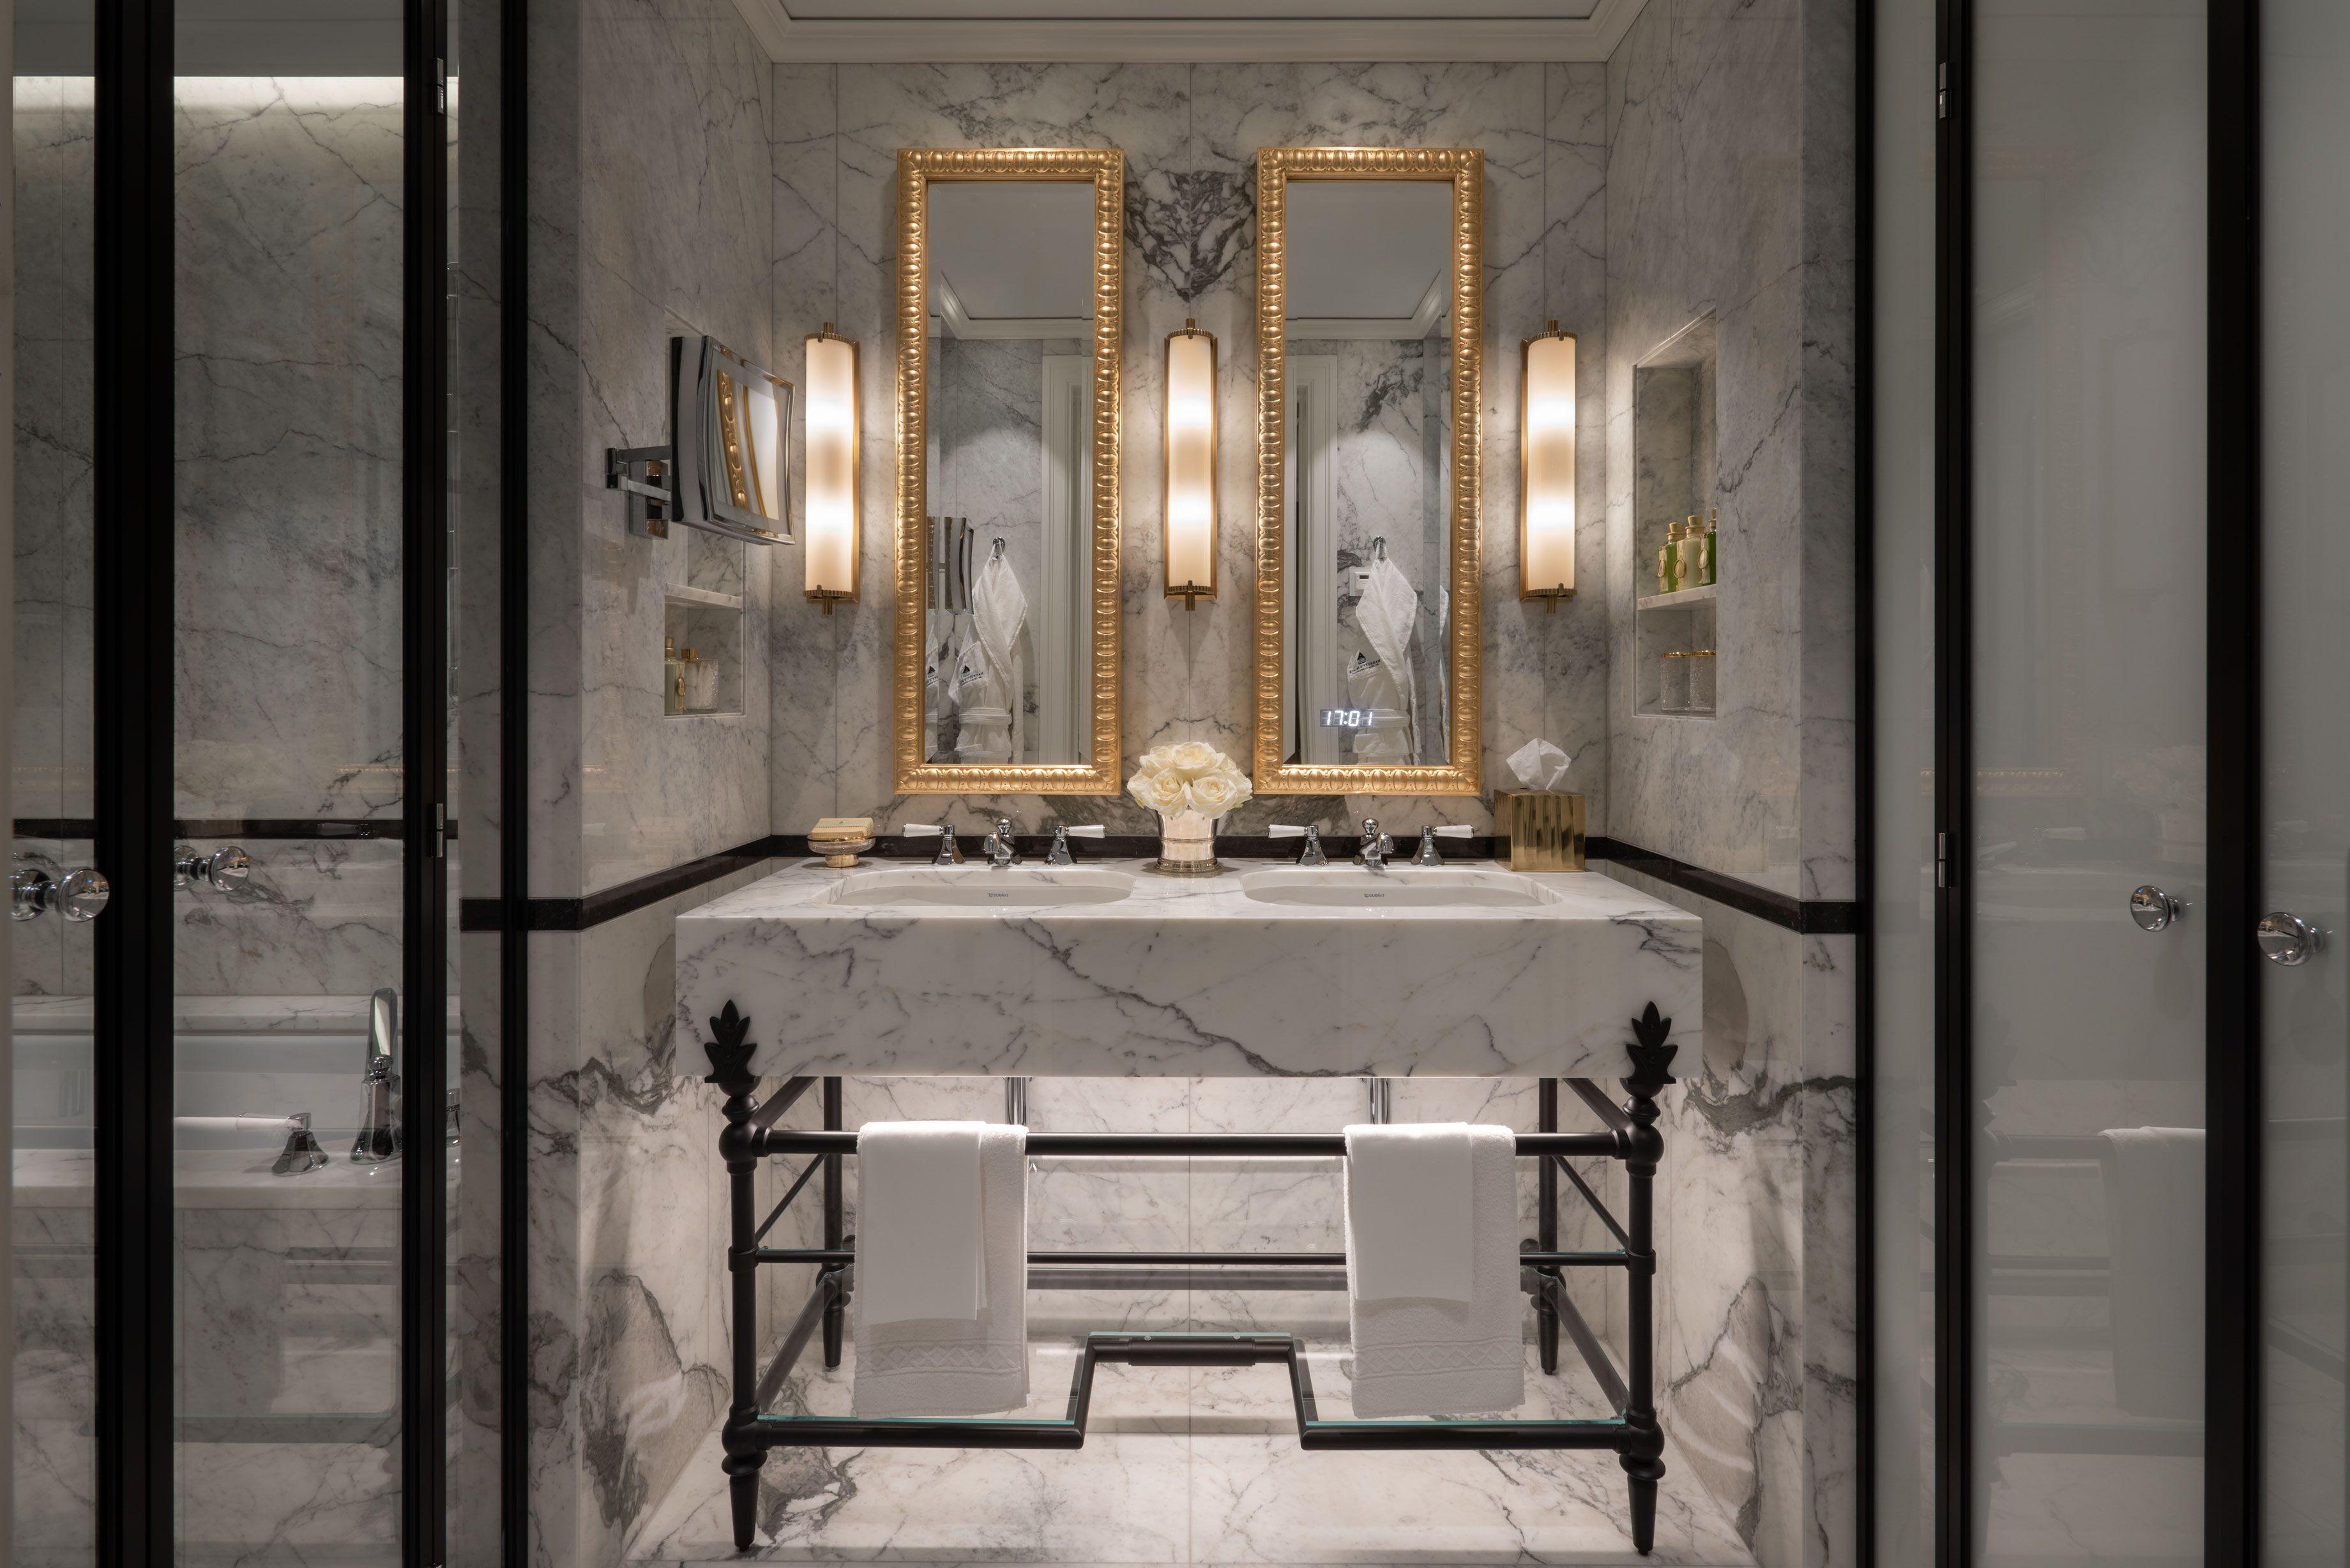 bathroom badrutt palace hotel